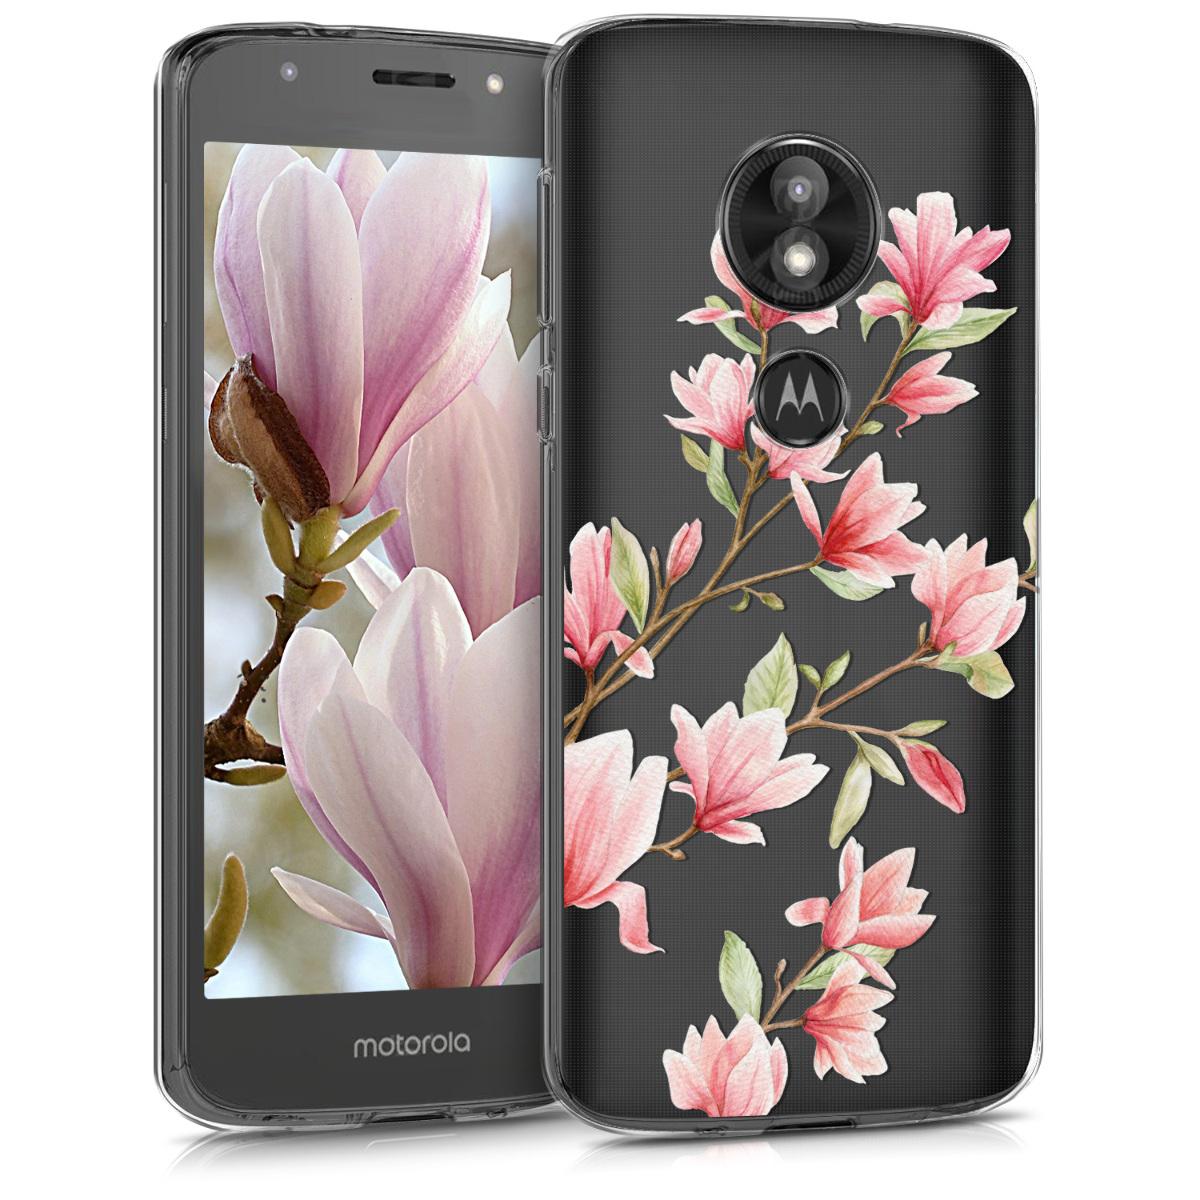 KW Θήκη Σιλικόνης Motorola Moto E5 Play - Light Pink / White / Transparent (46956.01)